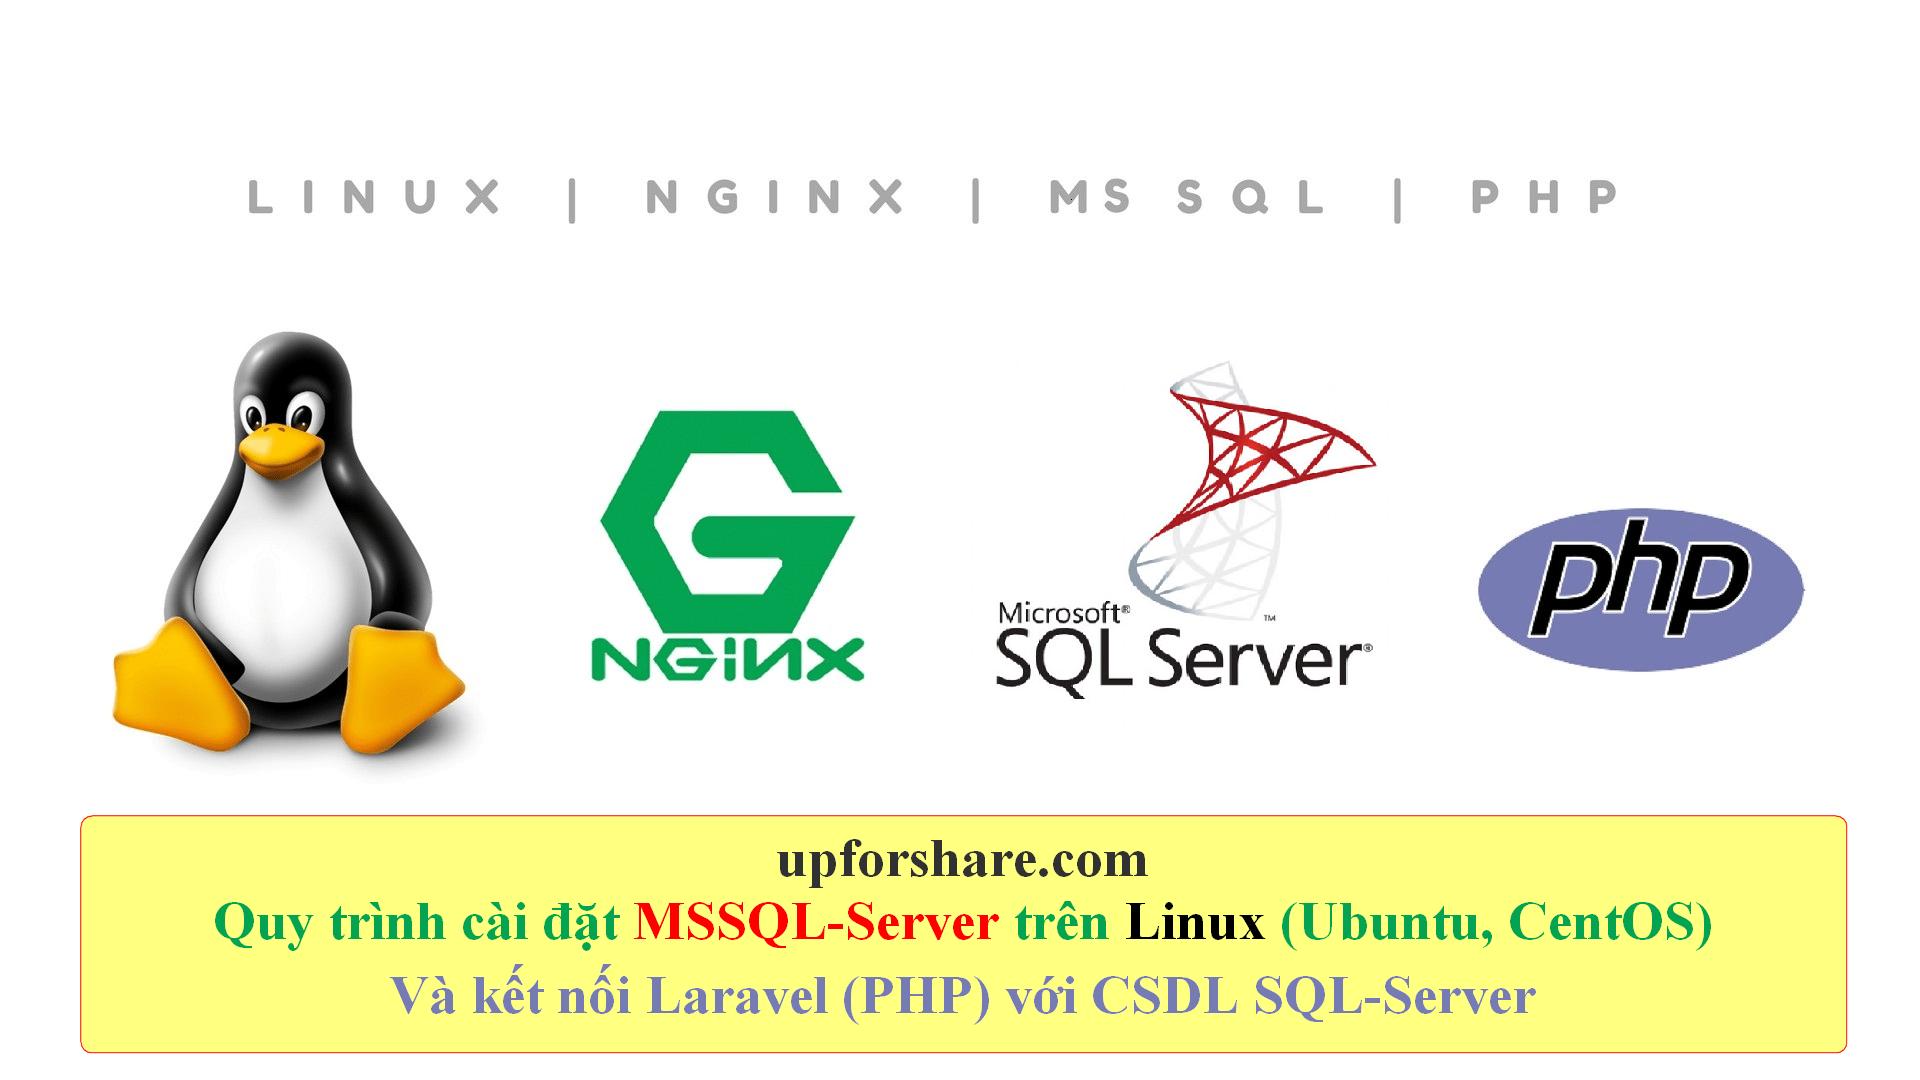 microsoft-drivers-php-cho-sql-server-tren-centos-7